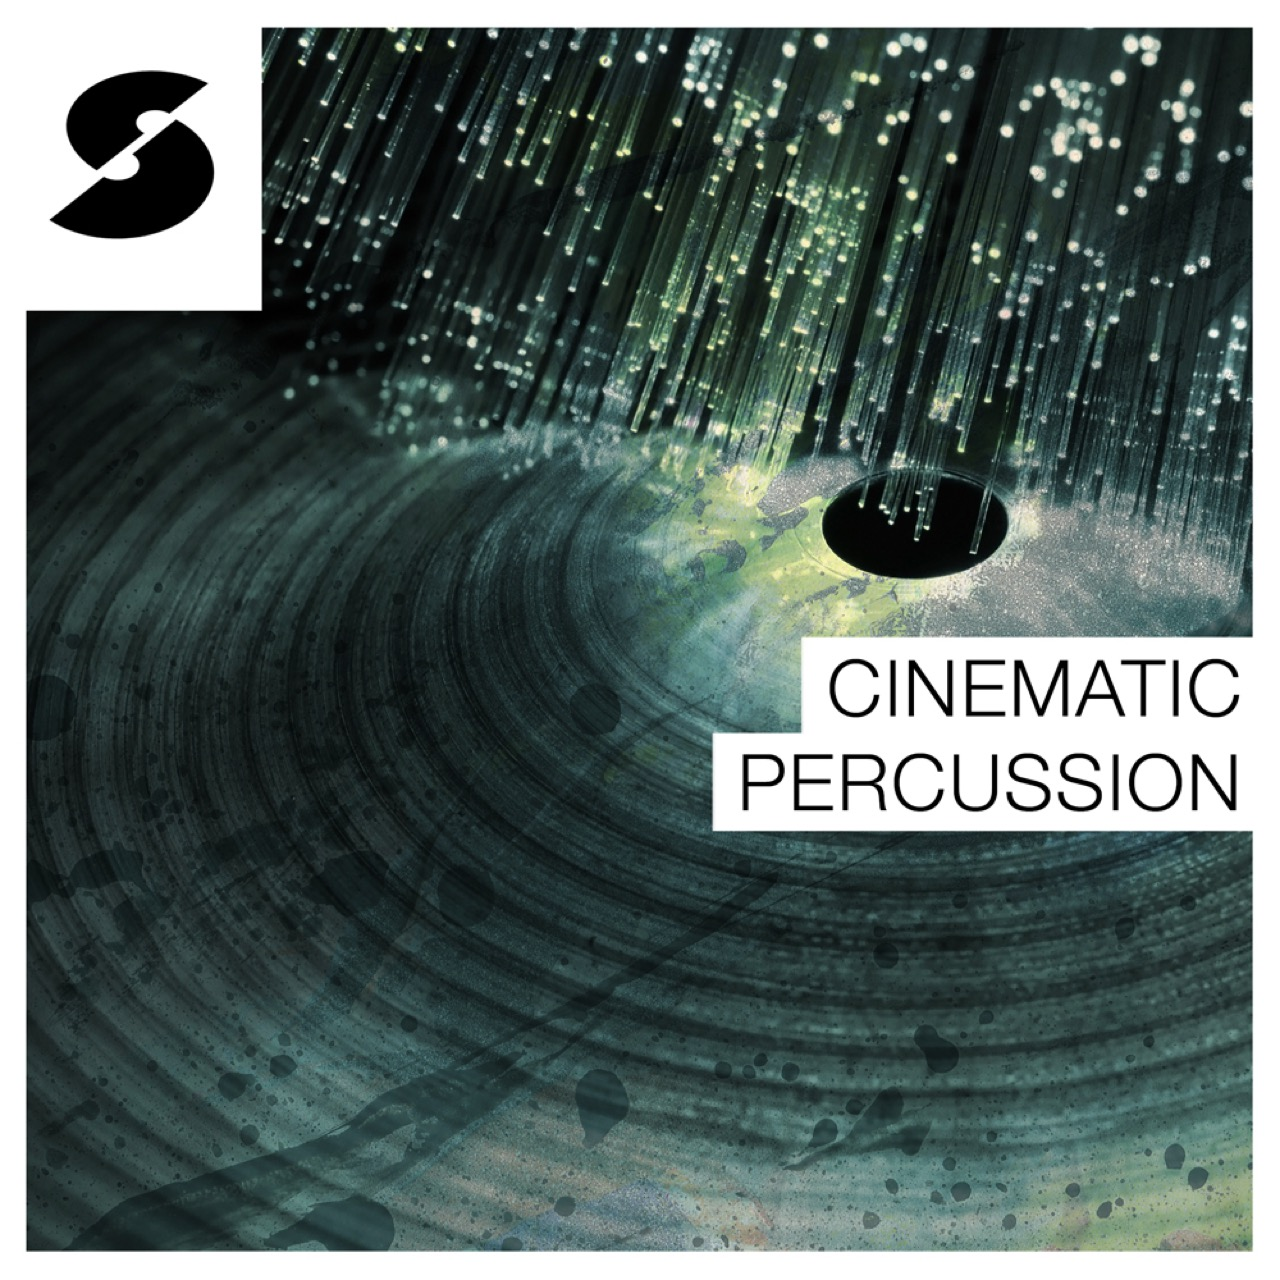 Cinematic percussion desktop email